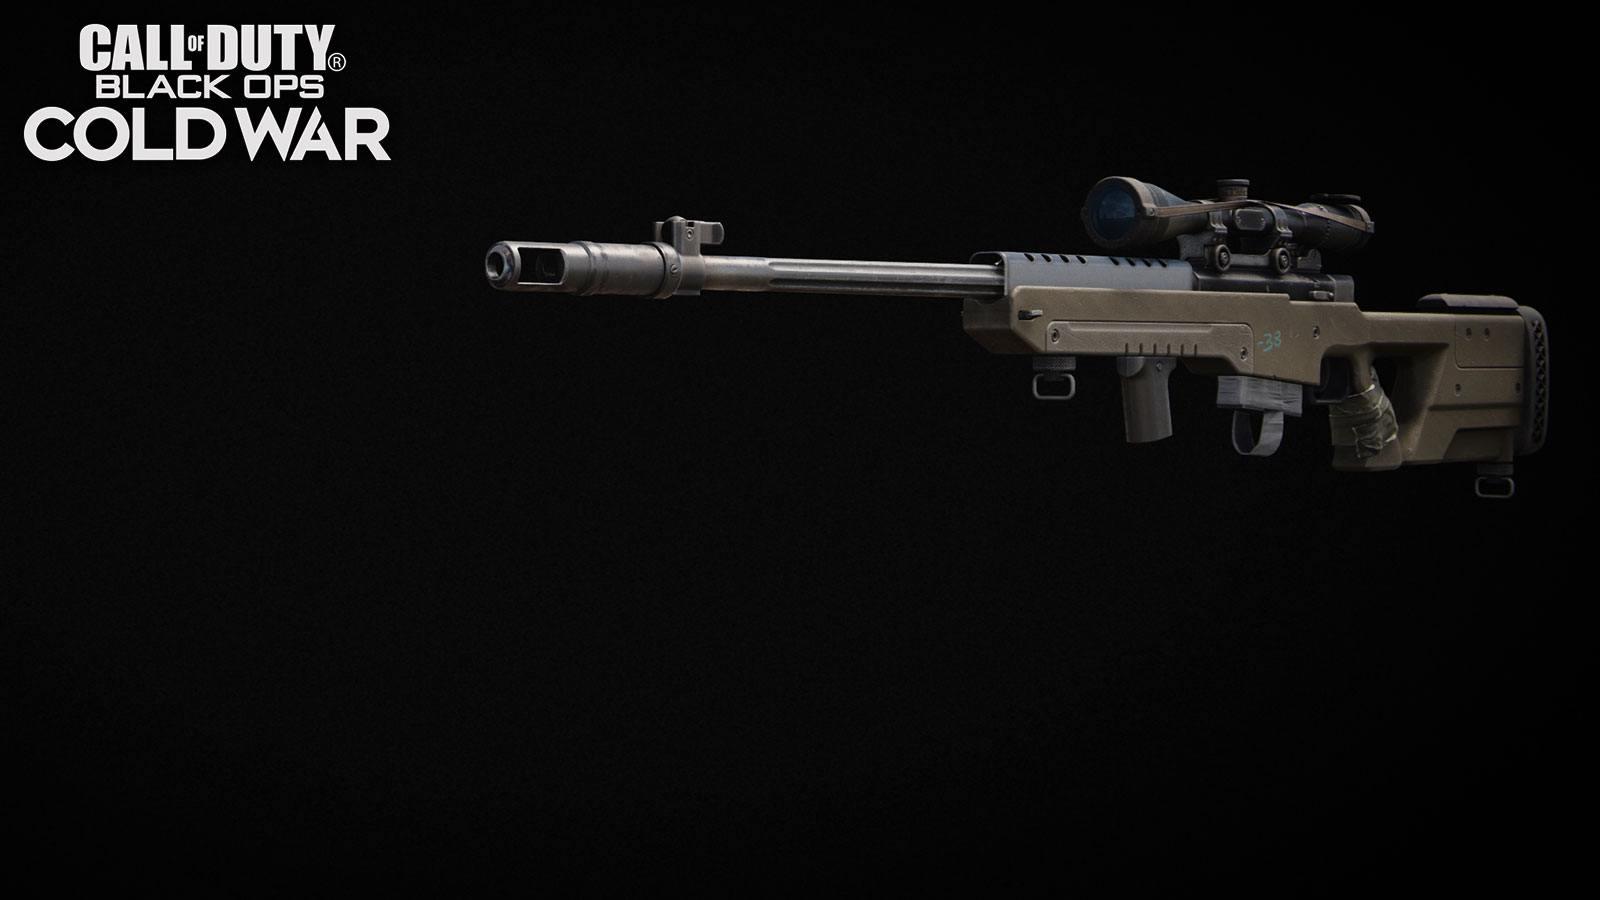 Black Ops Cold War Treyarch LW3 Tundra